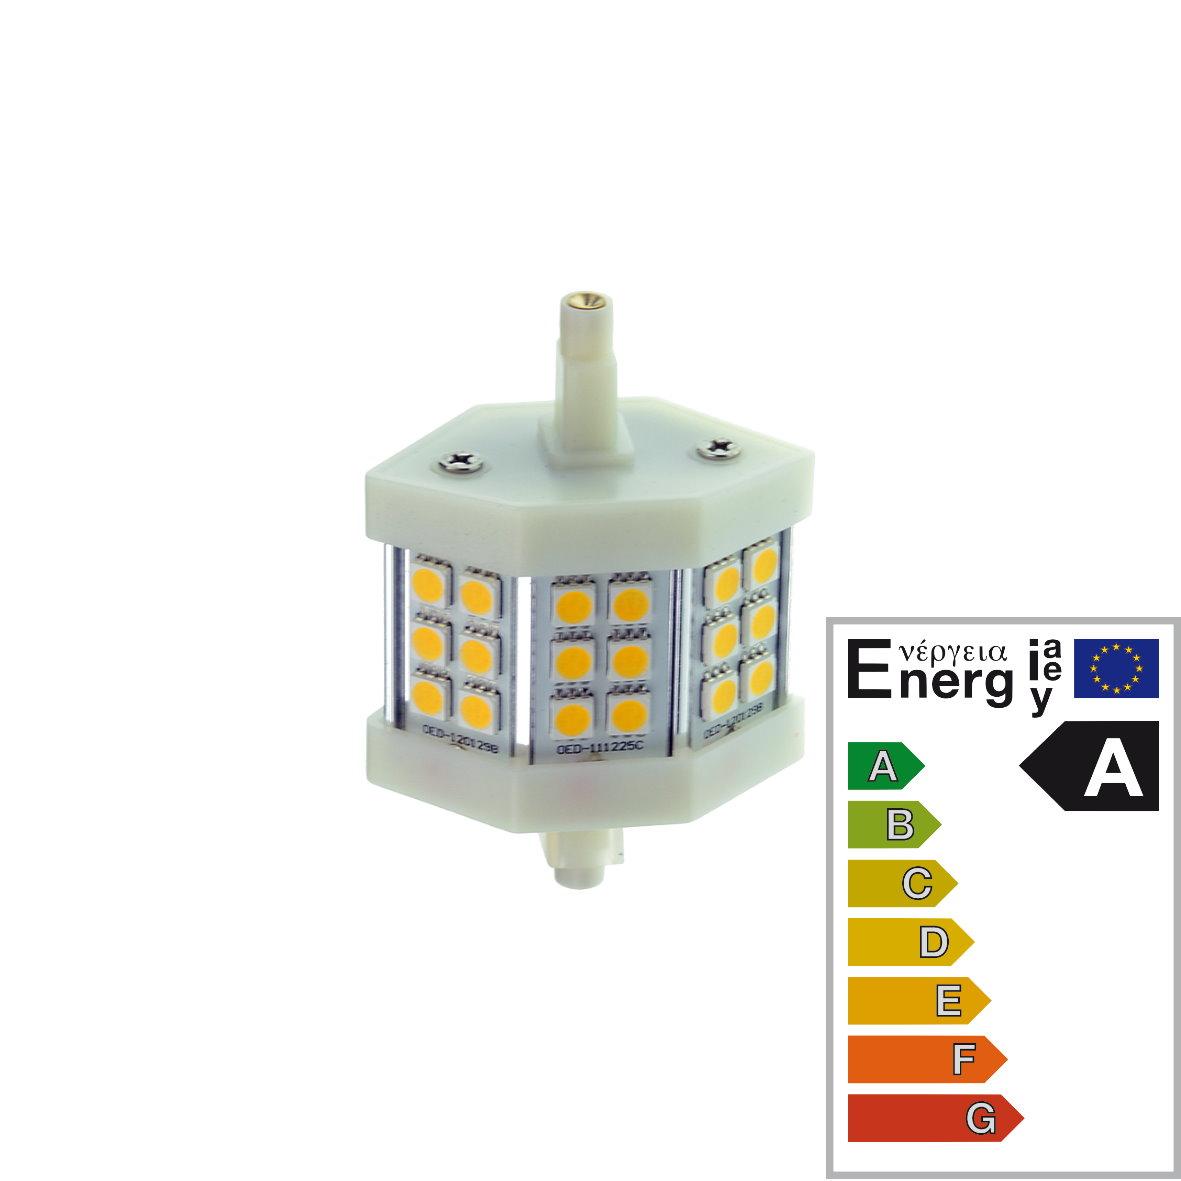 R7 60w Light Bulb